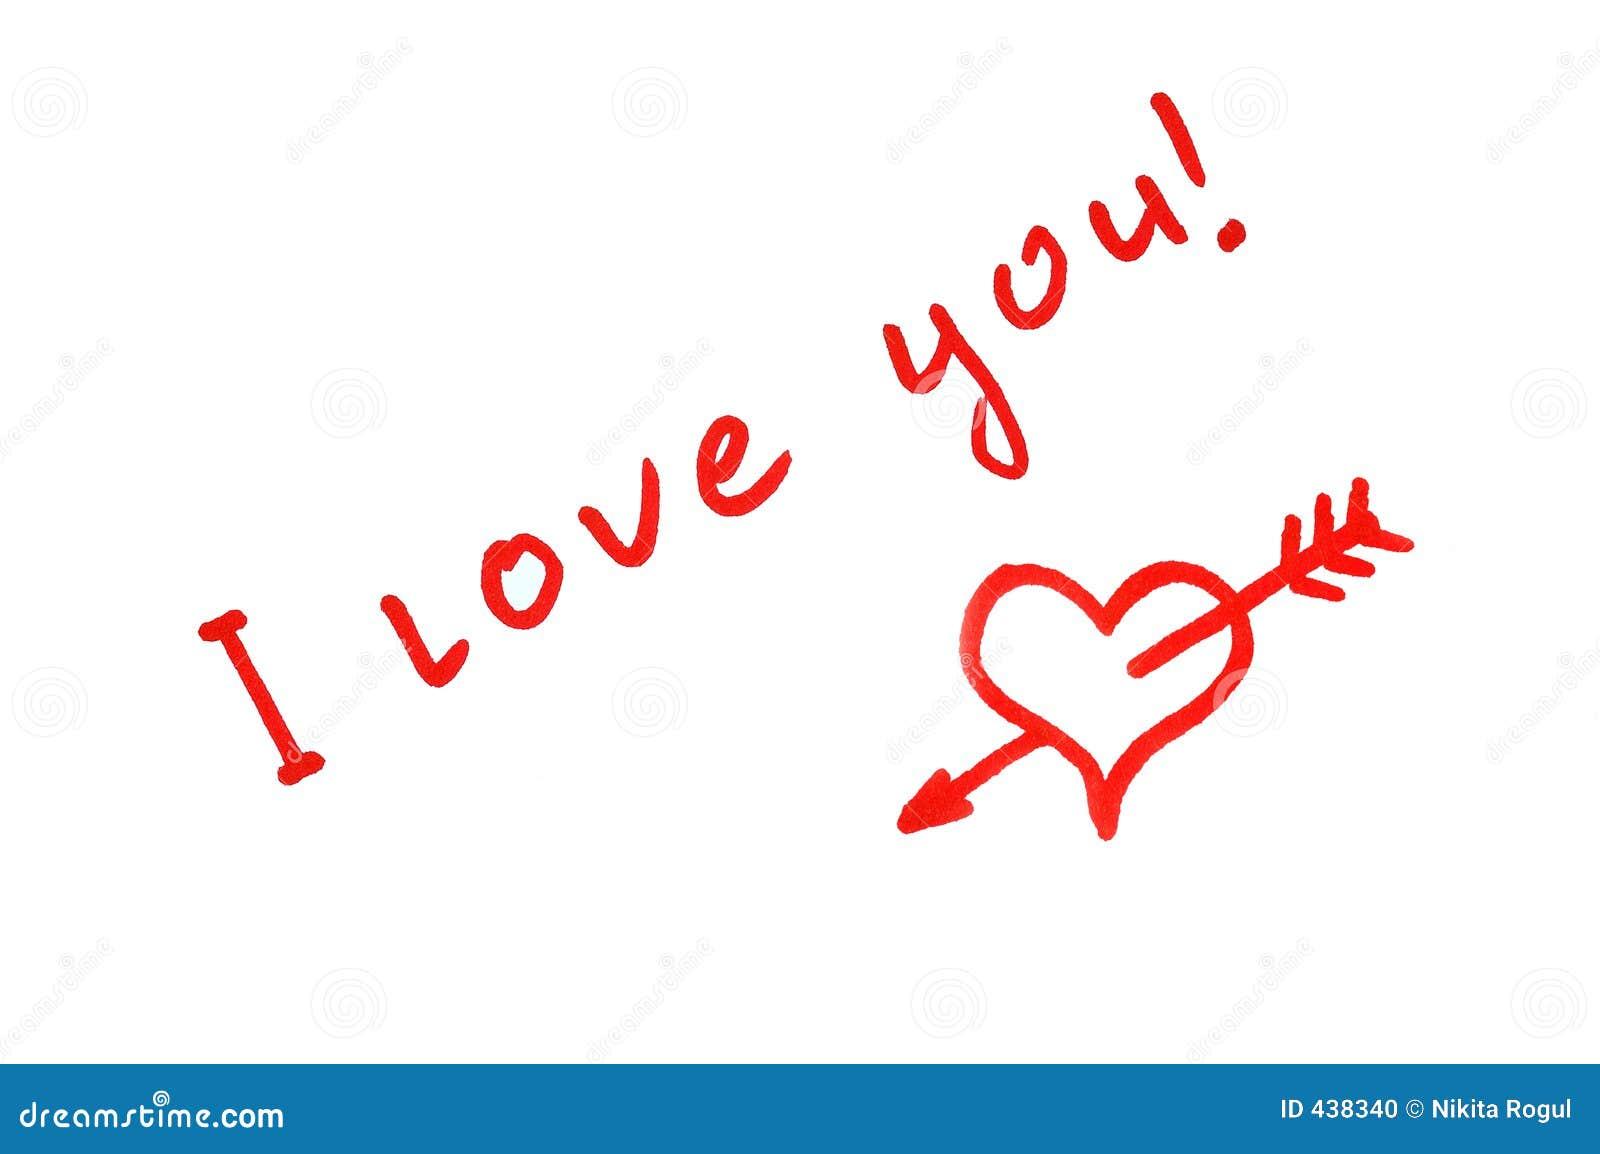 Https Www Dreamstime Com Stock Photo I Love You Image438340